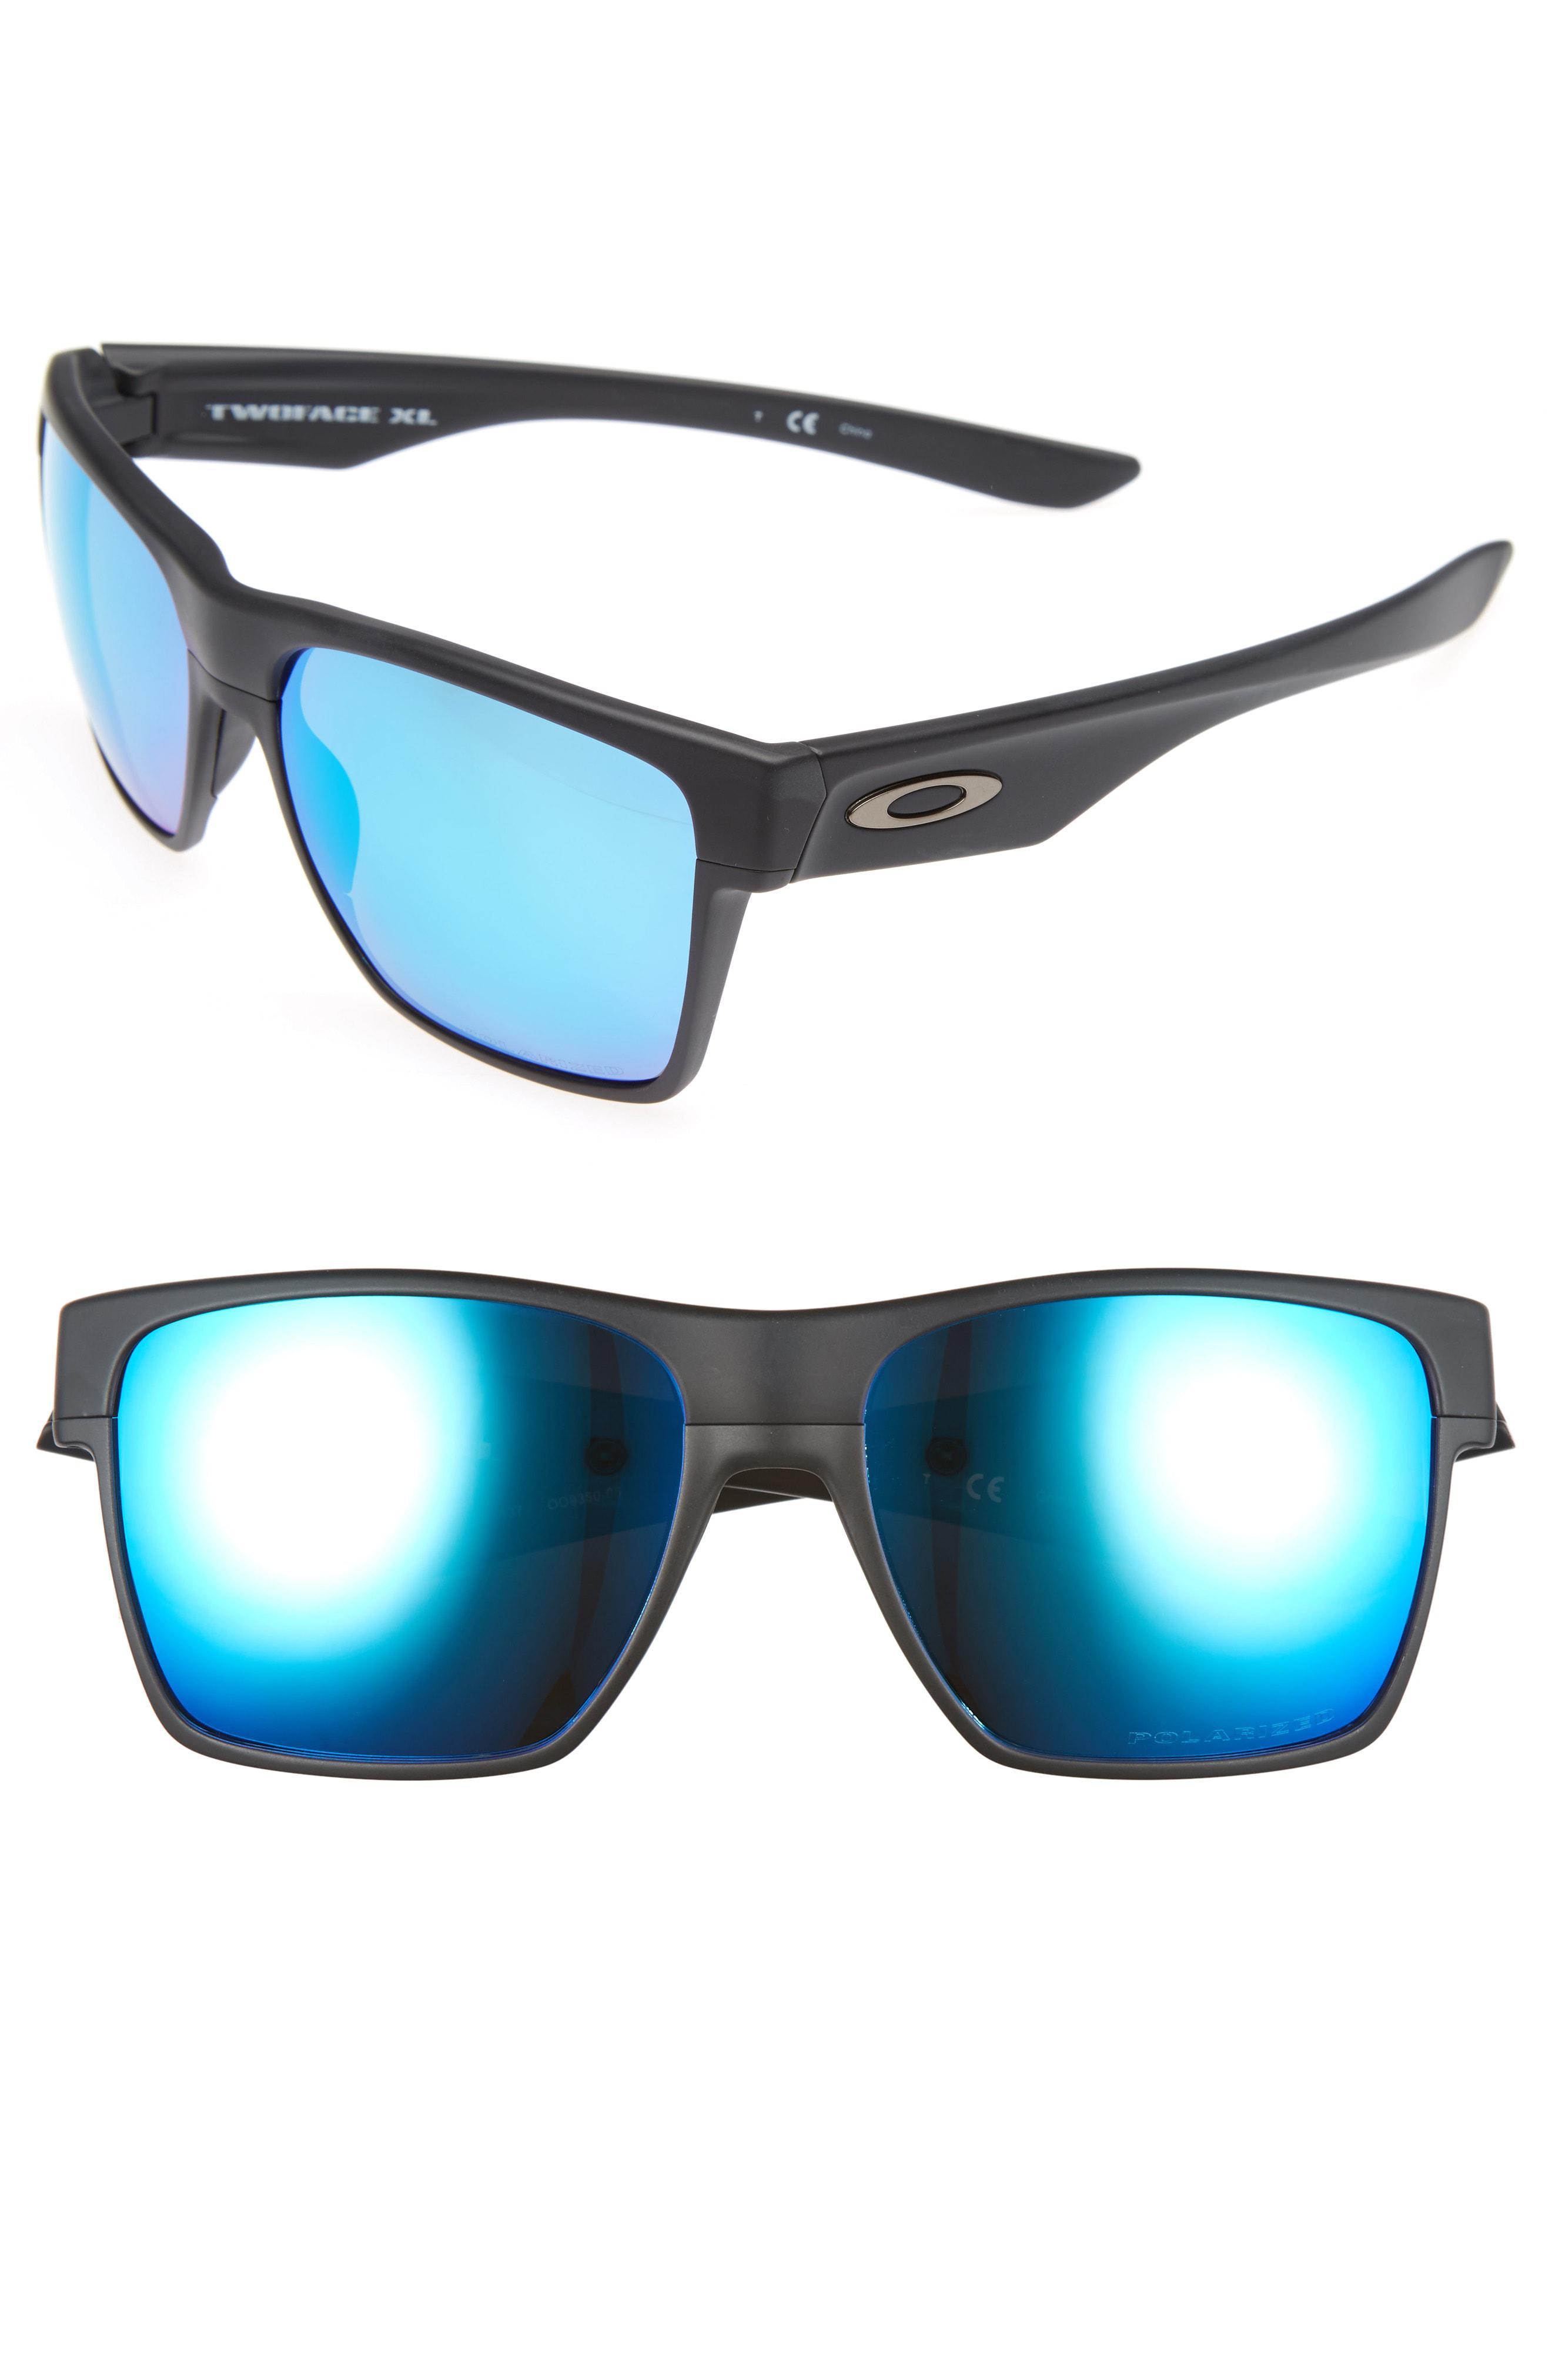 71c7abe54b Lyst - Oakley Twoface Xl 59mm Polarized Sunglasses - in Blue for Men